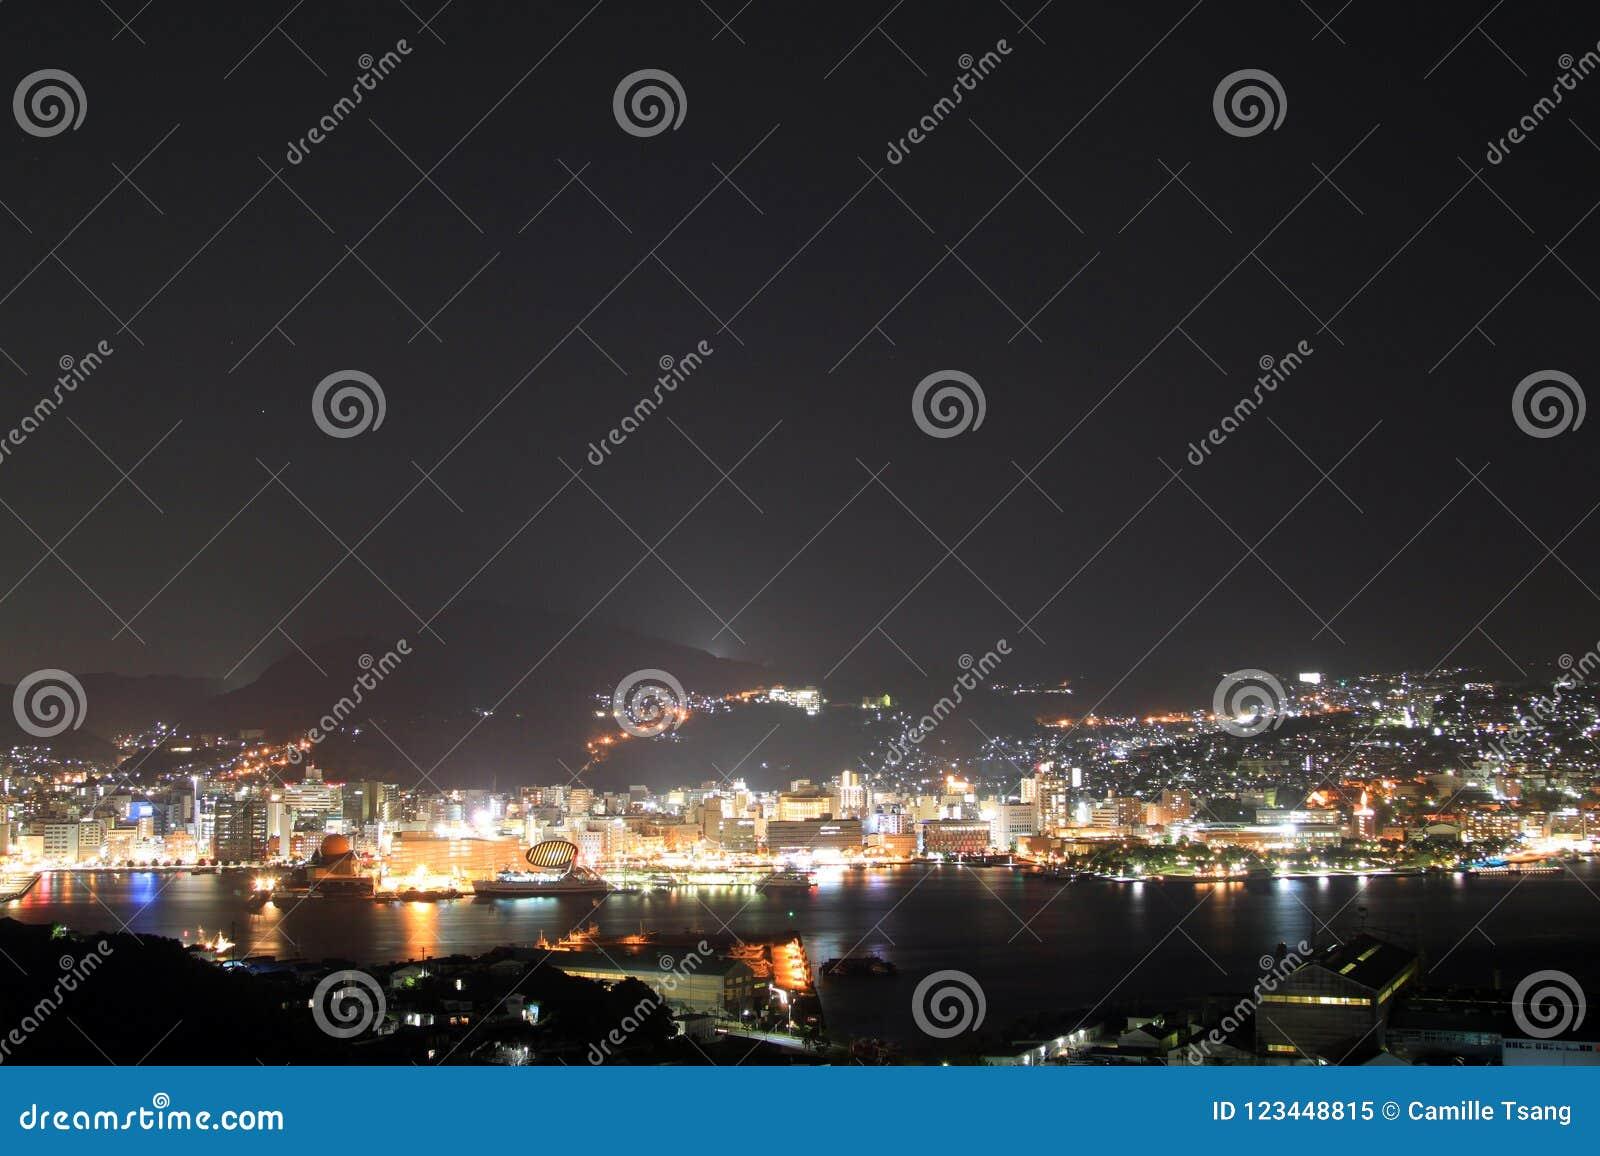 Night View Of Nagasaki, Japan Stock Image - Image of downtown, gold